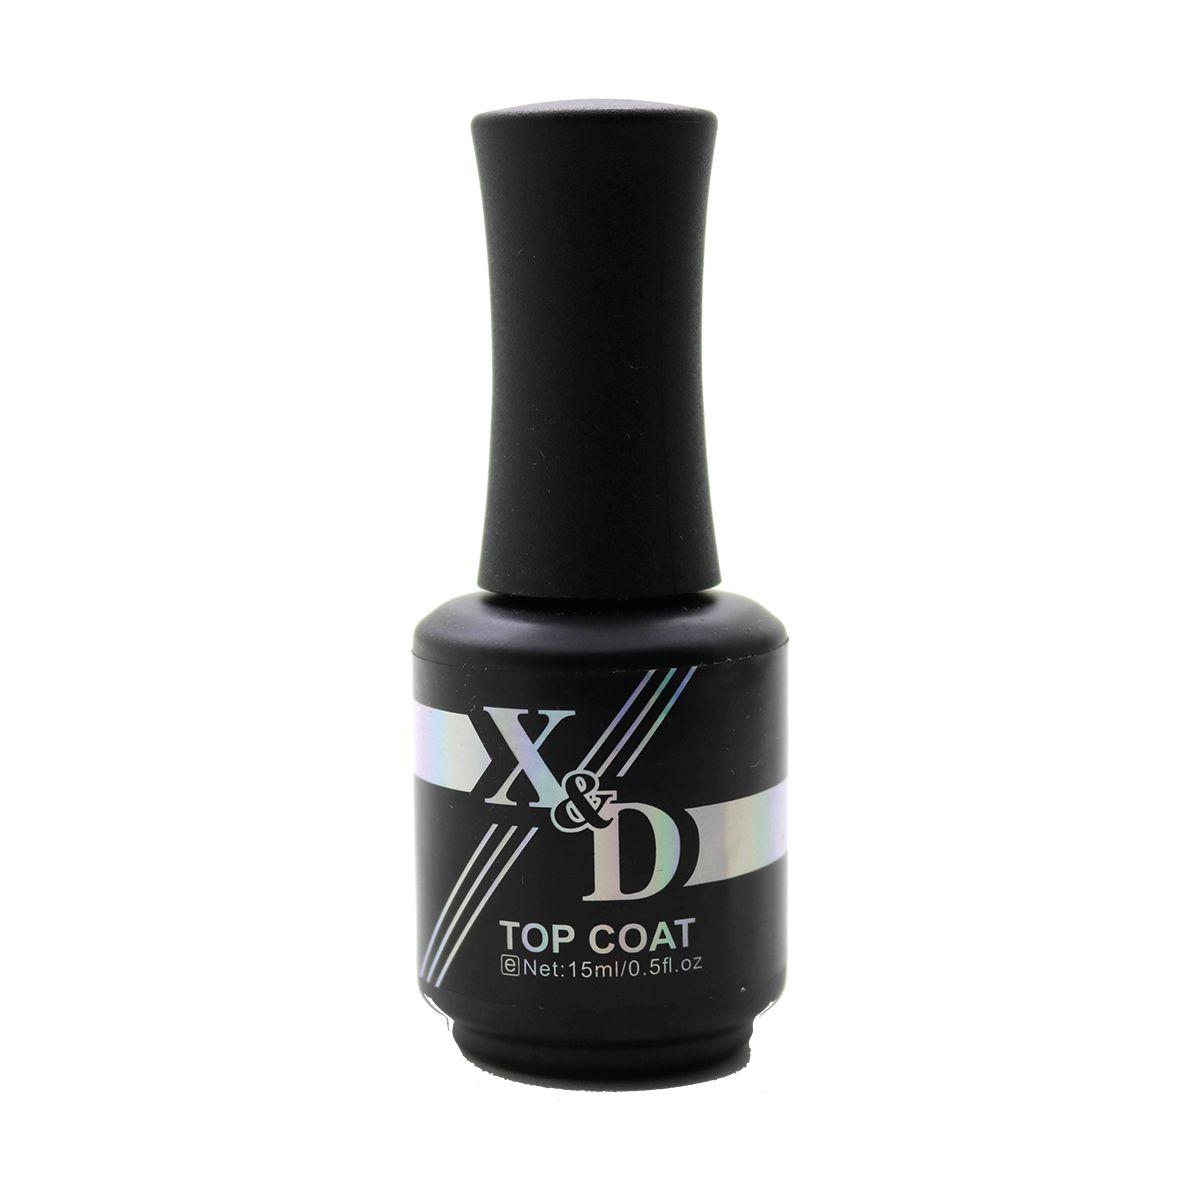 Kit Unha Gel Acrigel Led UV Sun 5x 54W Top Coat Primer TopB